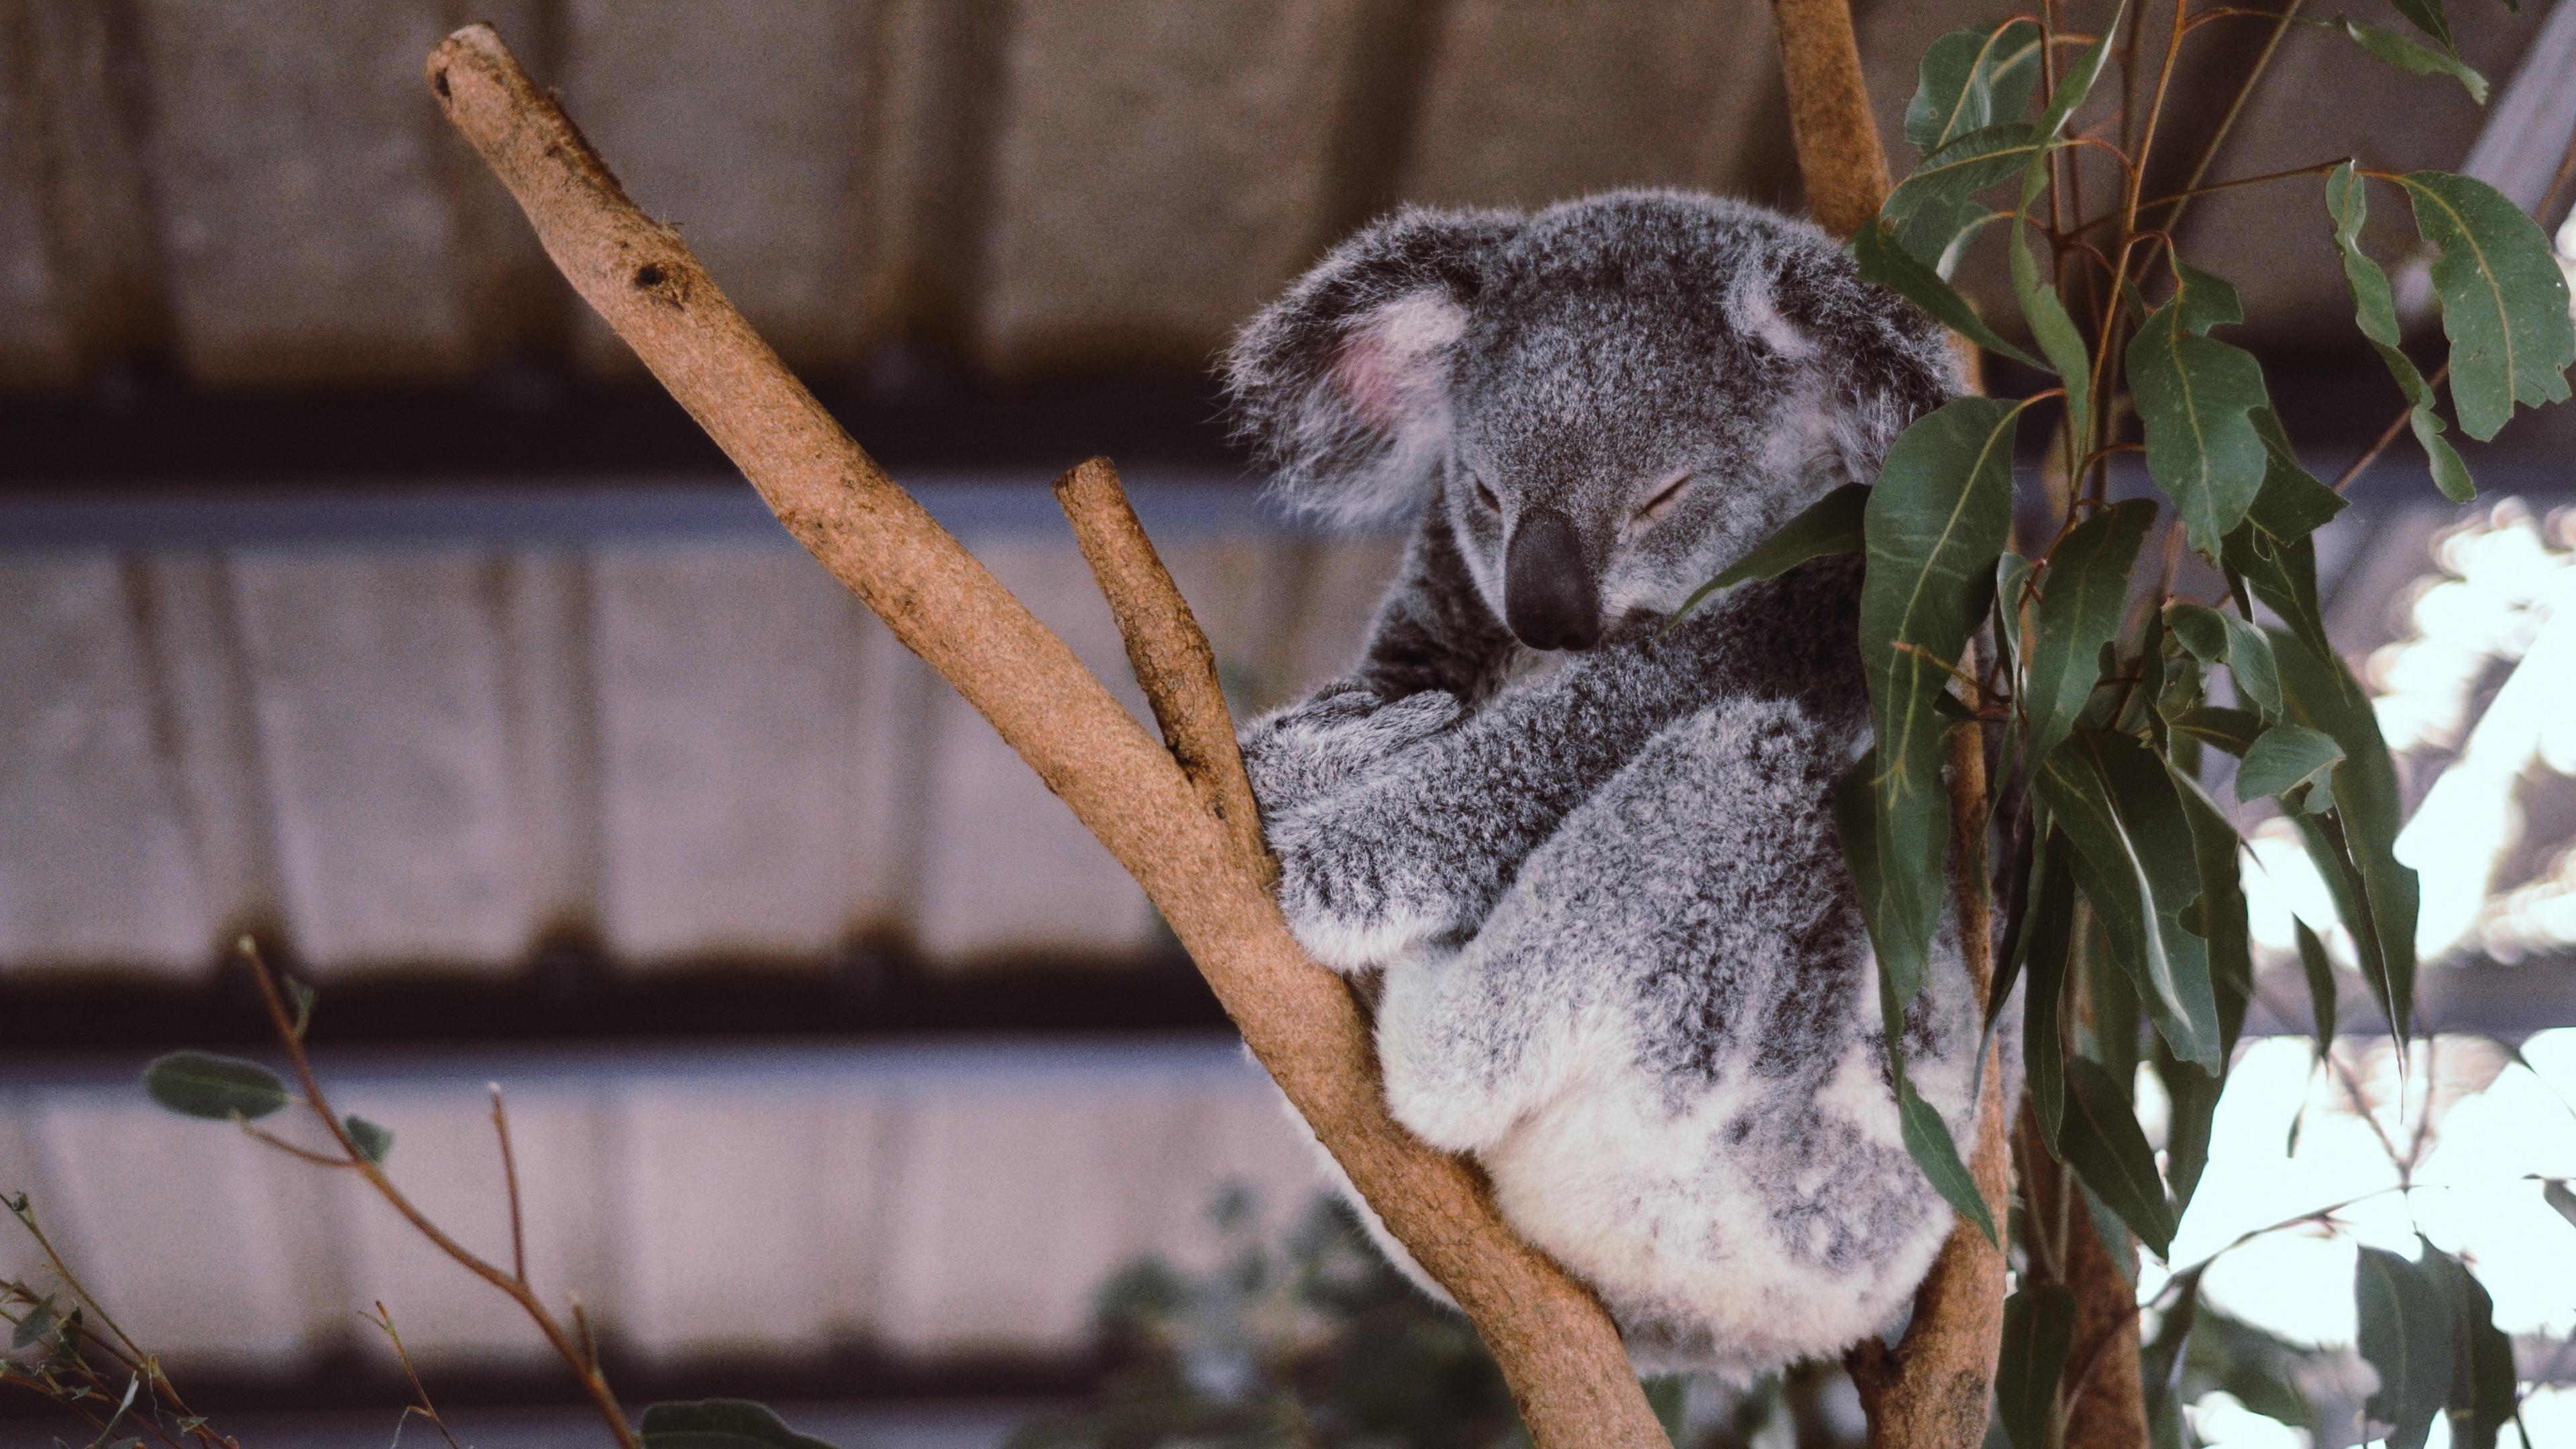 koala eucalyptus tree sleep 4k 1542241447 - koala, eucalyptus, tree, sleep 4k - tree, koala, Eucalyptus